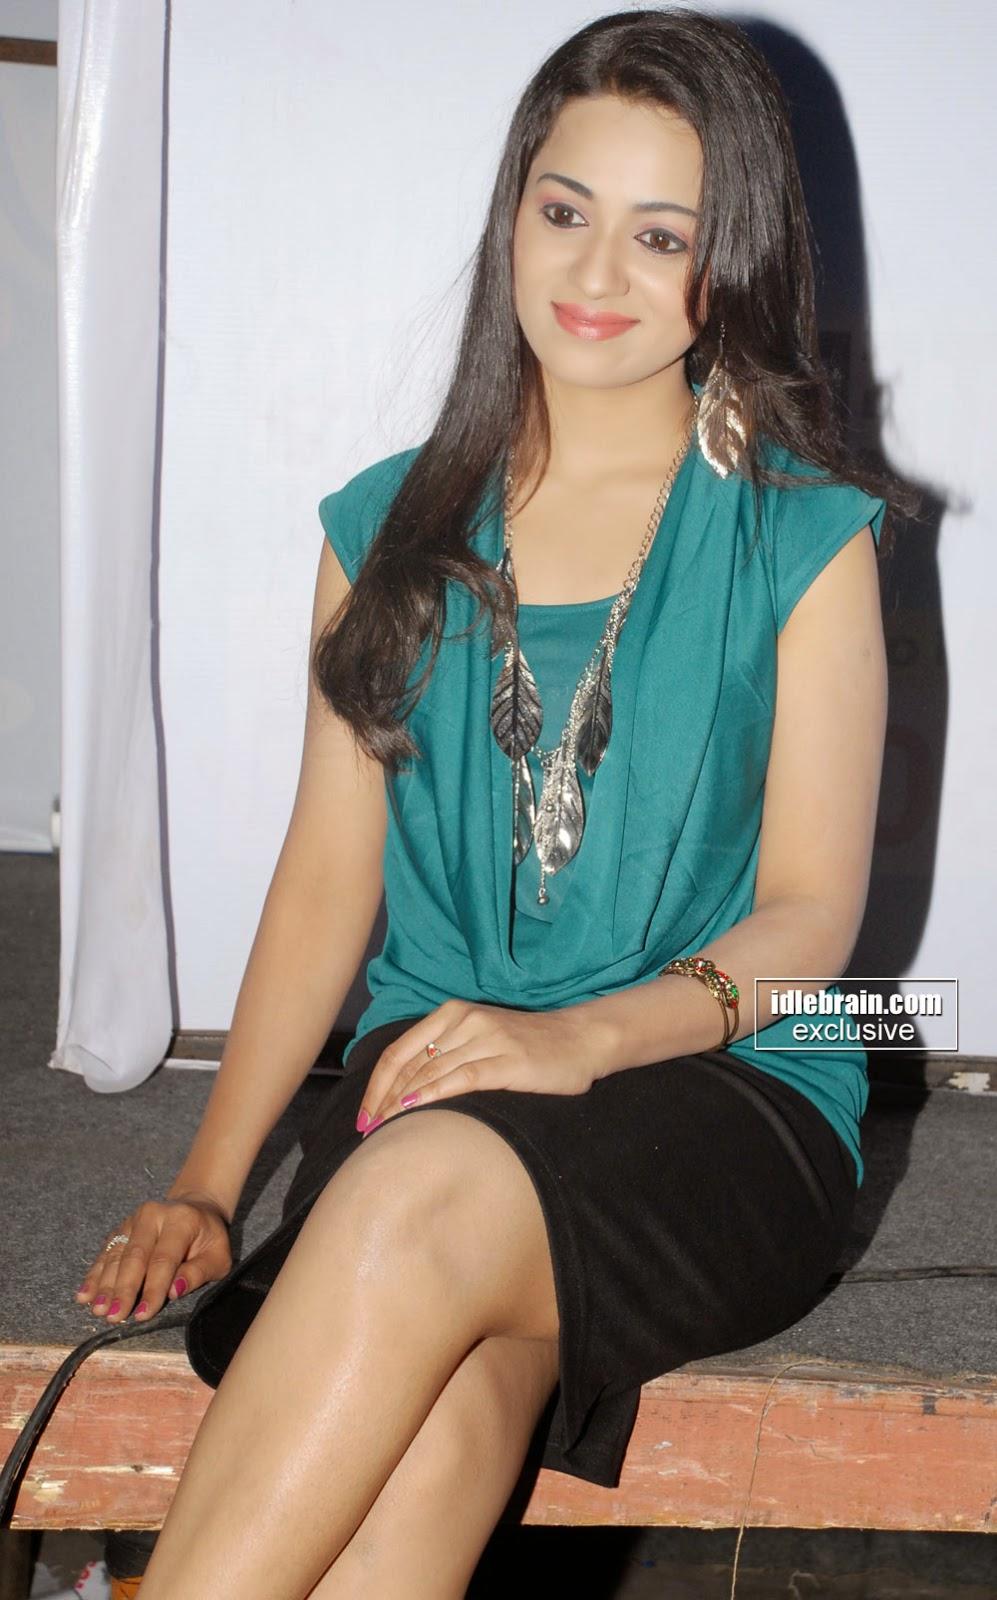 Reshma thighs n bare legs